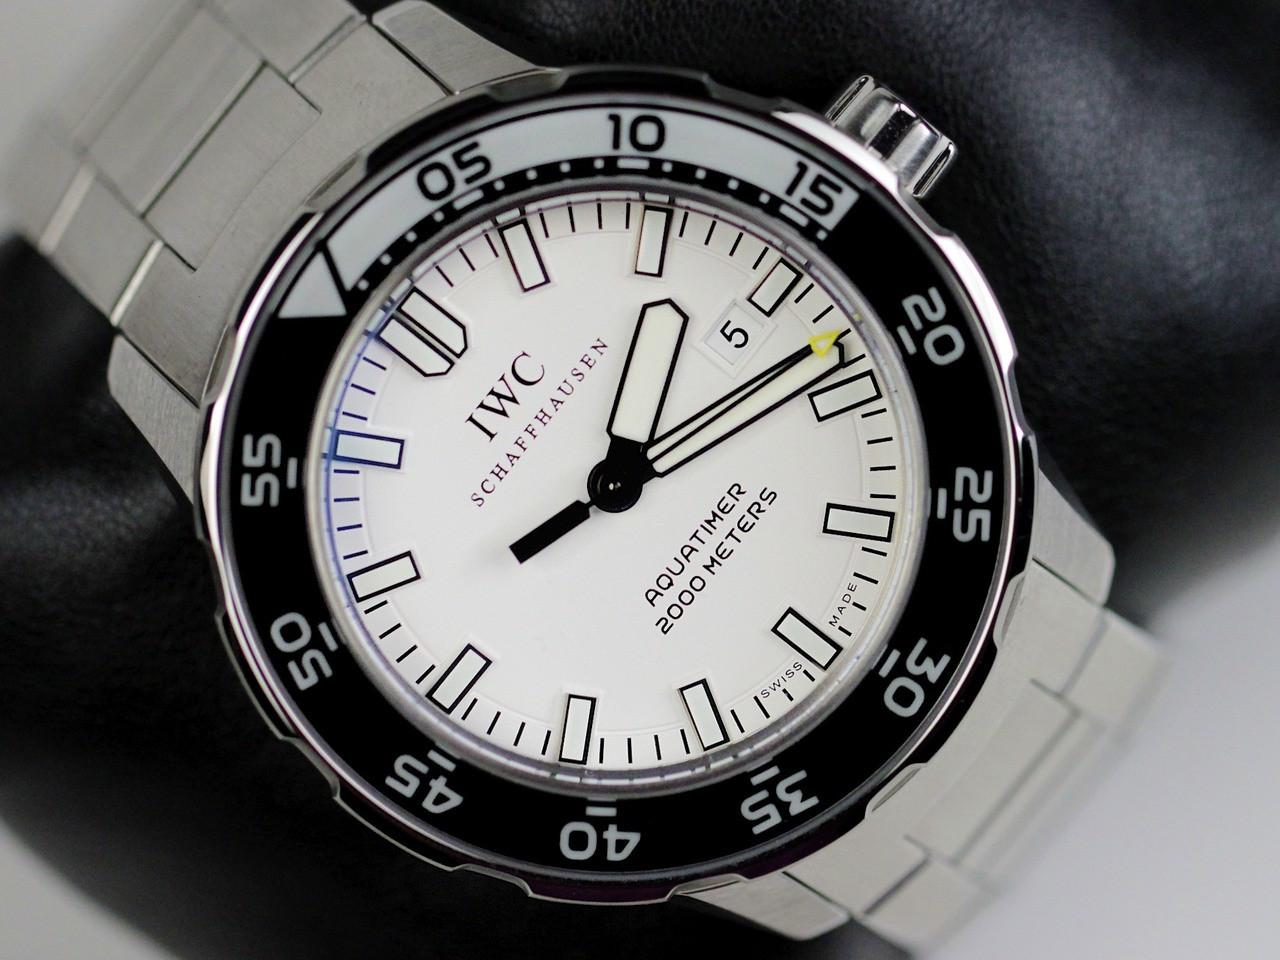 Dial - IWC Watch - Aquatimer 2000 Automatic IW356809 - www.Legendoftime.com - Chicago Watch Center